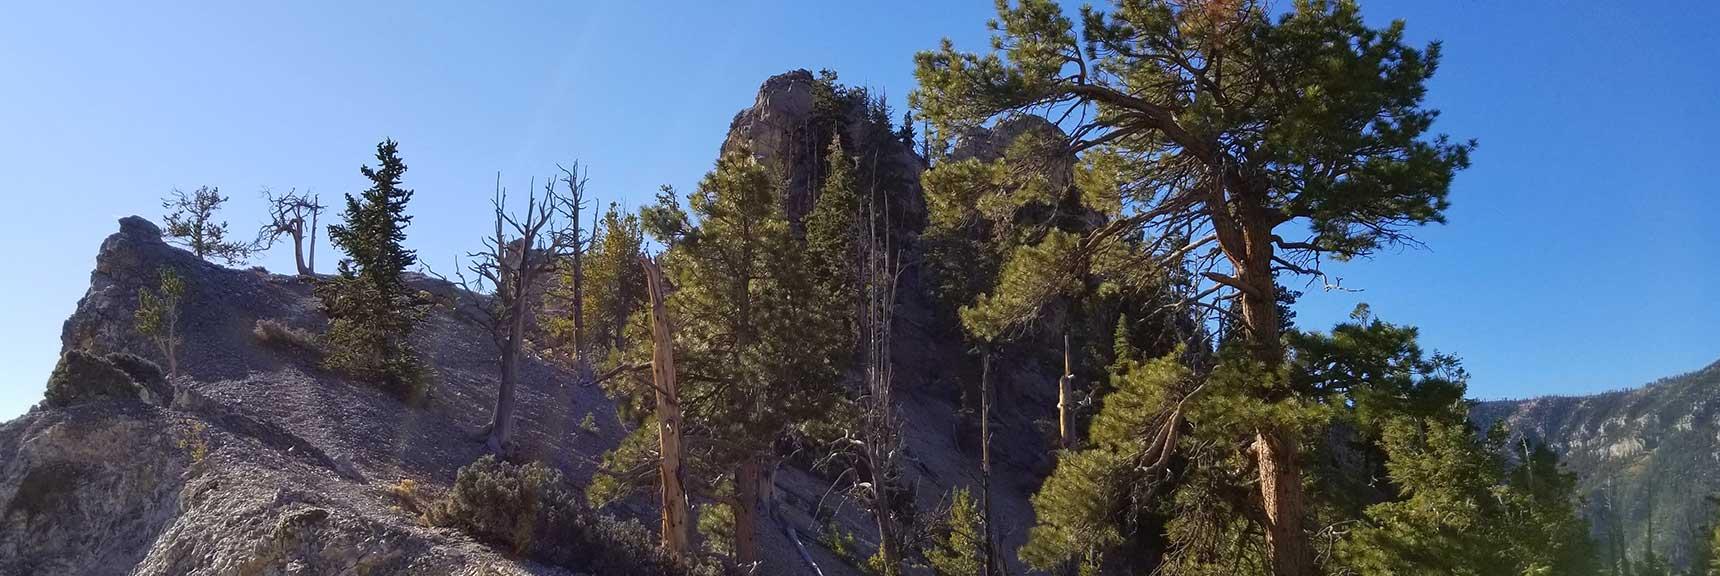 West side of Cockscomb Ridge, in Mt. Charleston Wilderness, Nevada